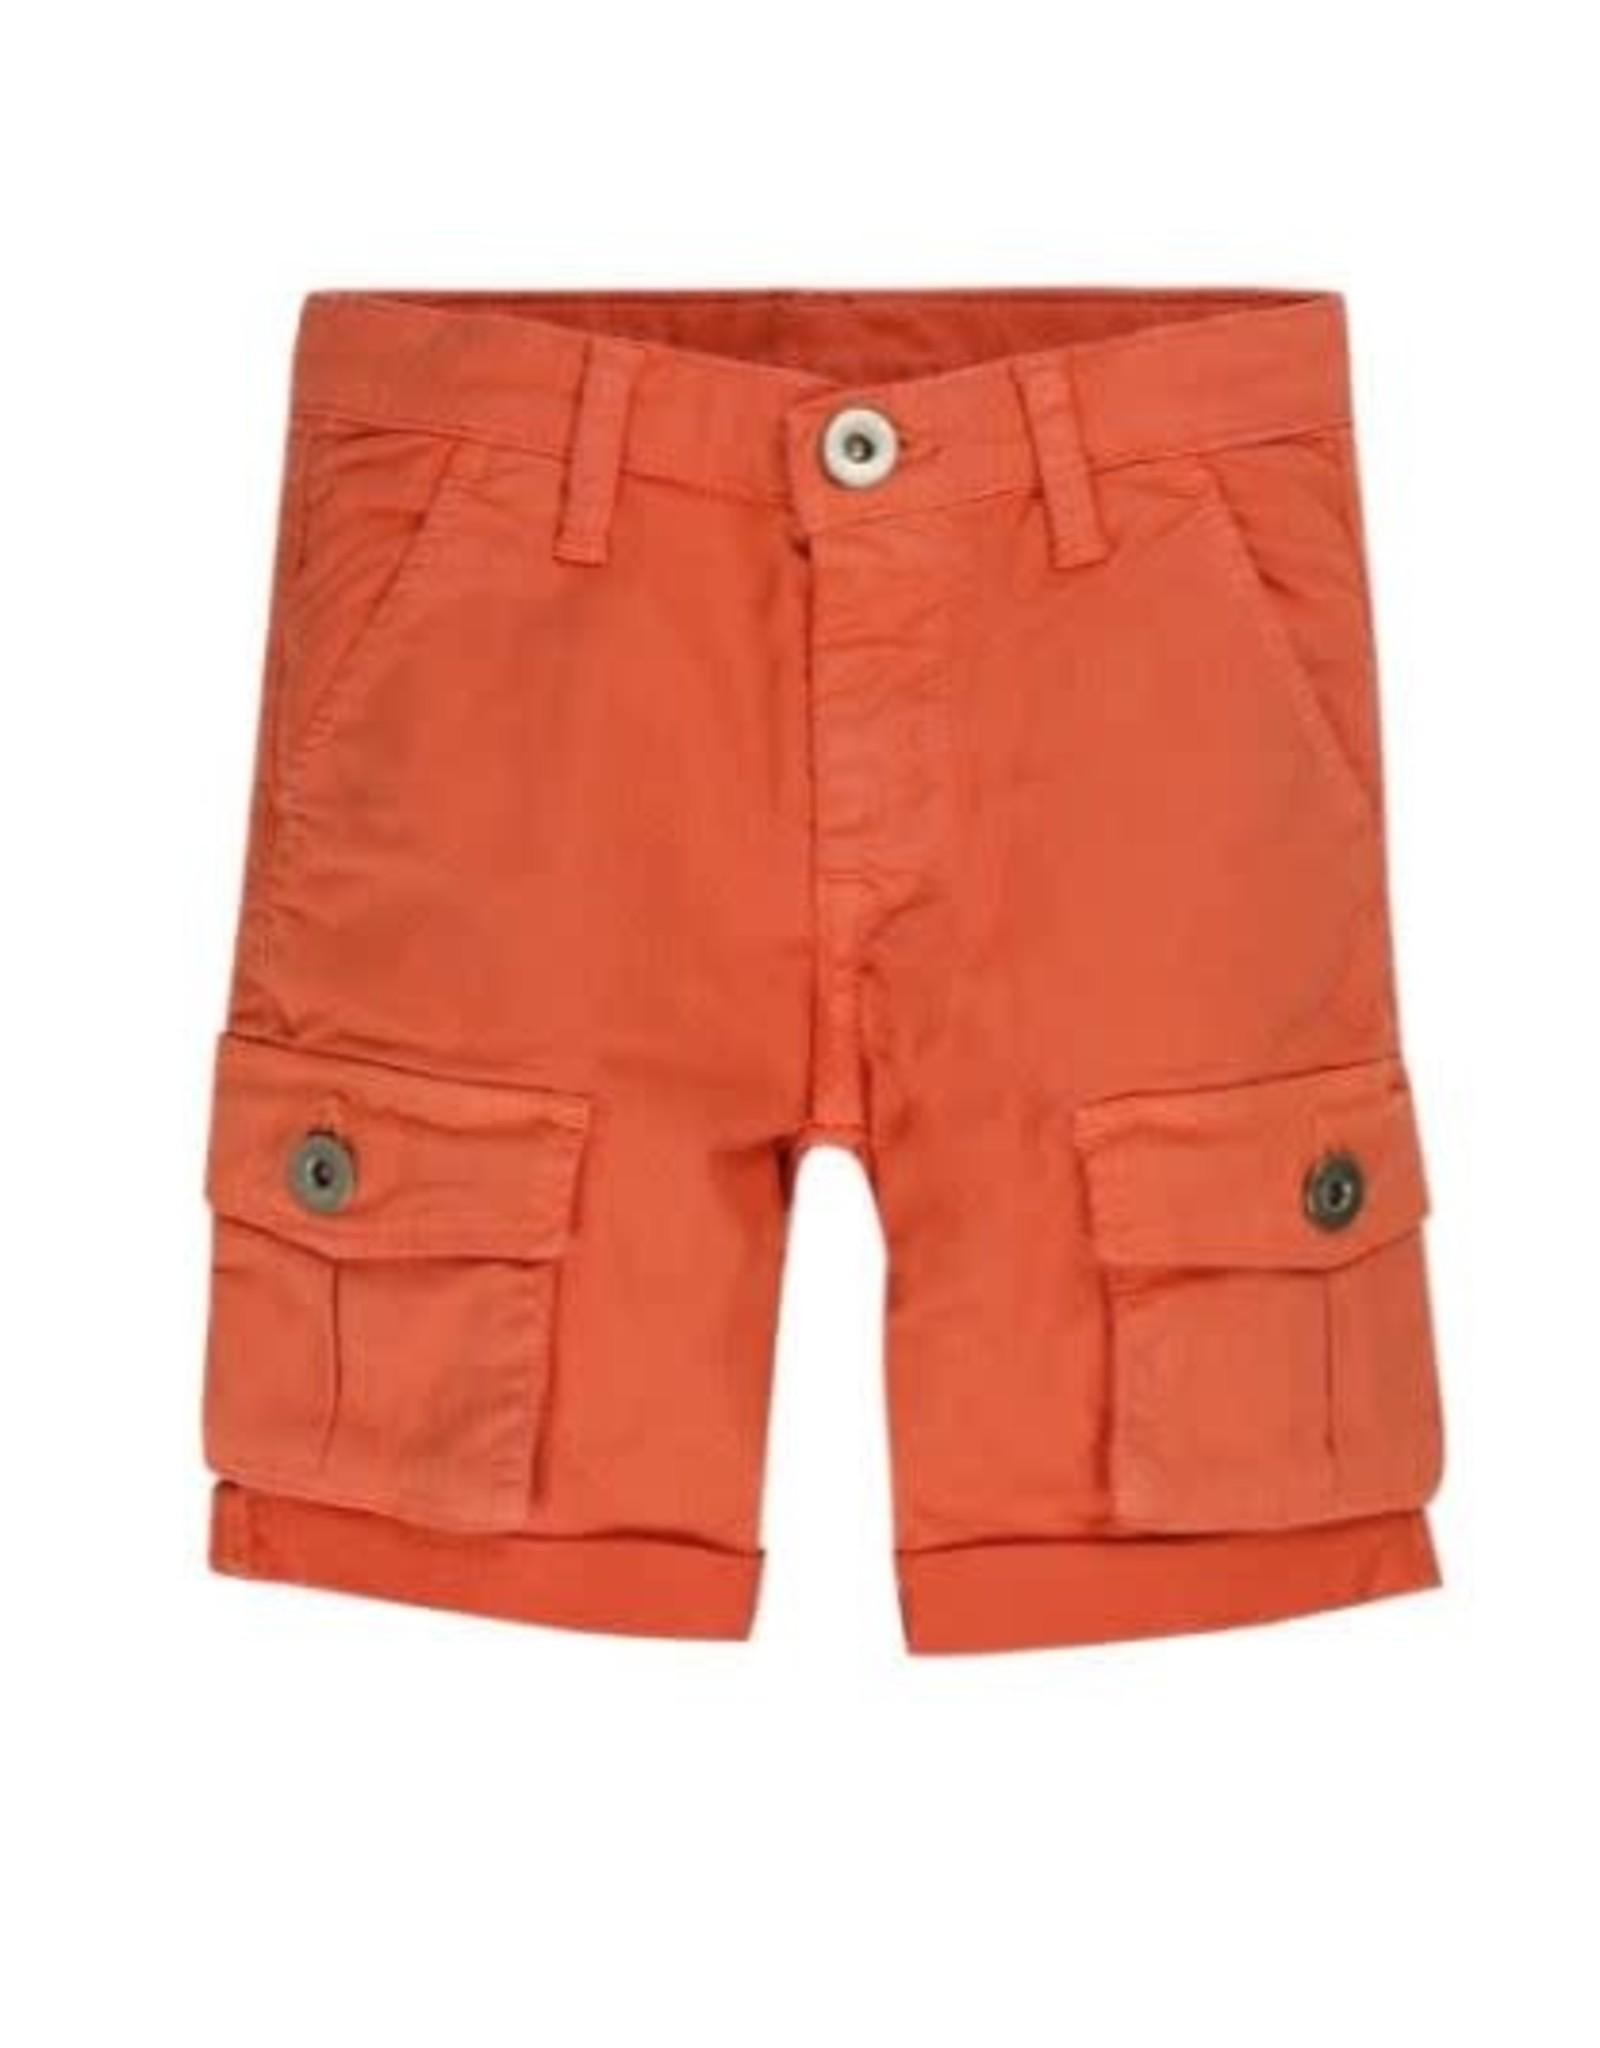 EMC Twill Stretch Shorts - Orange